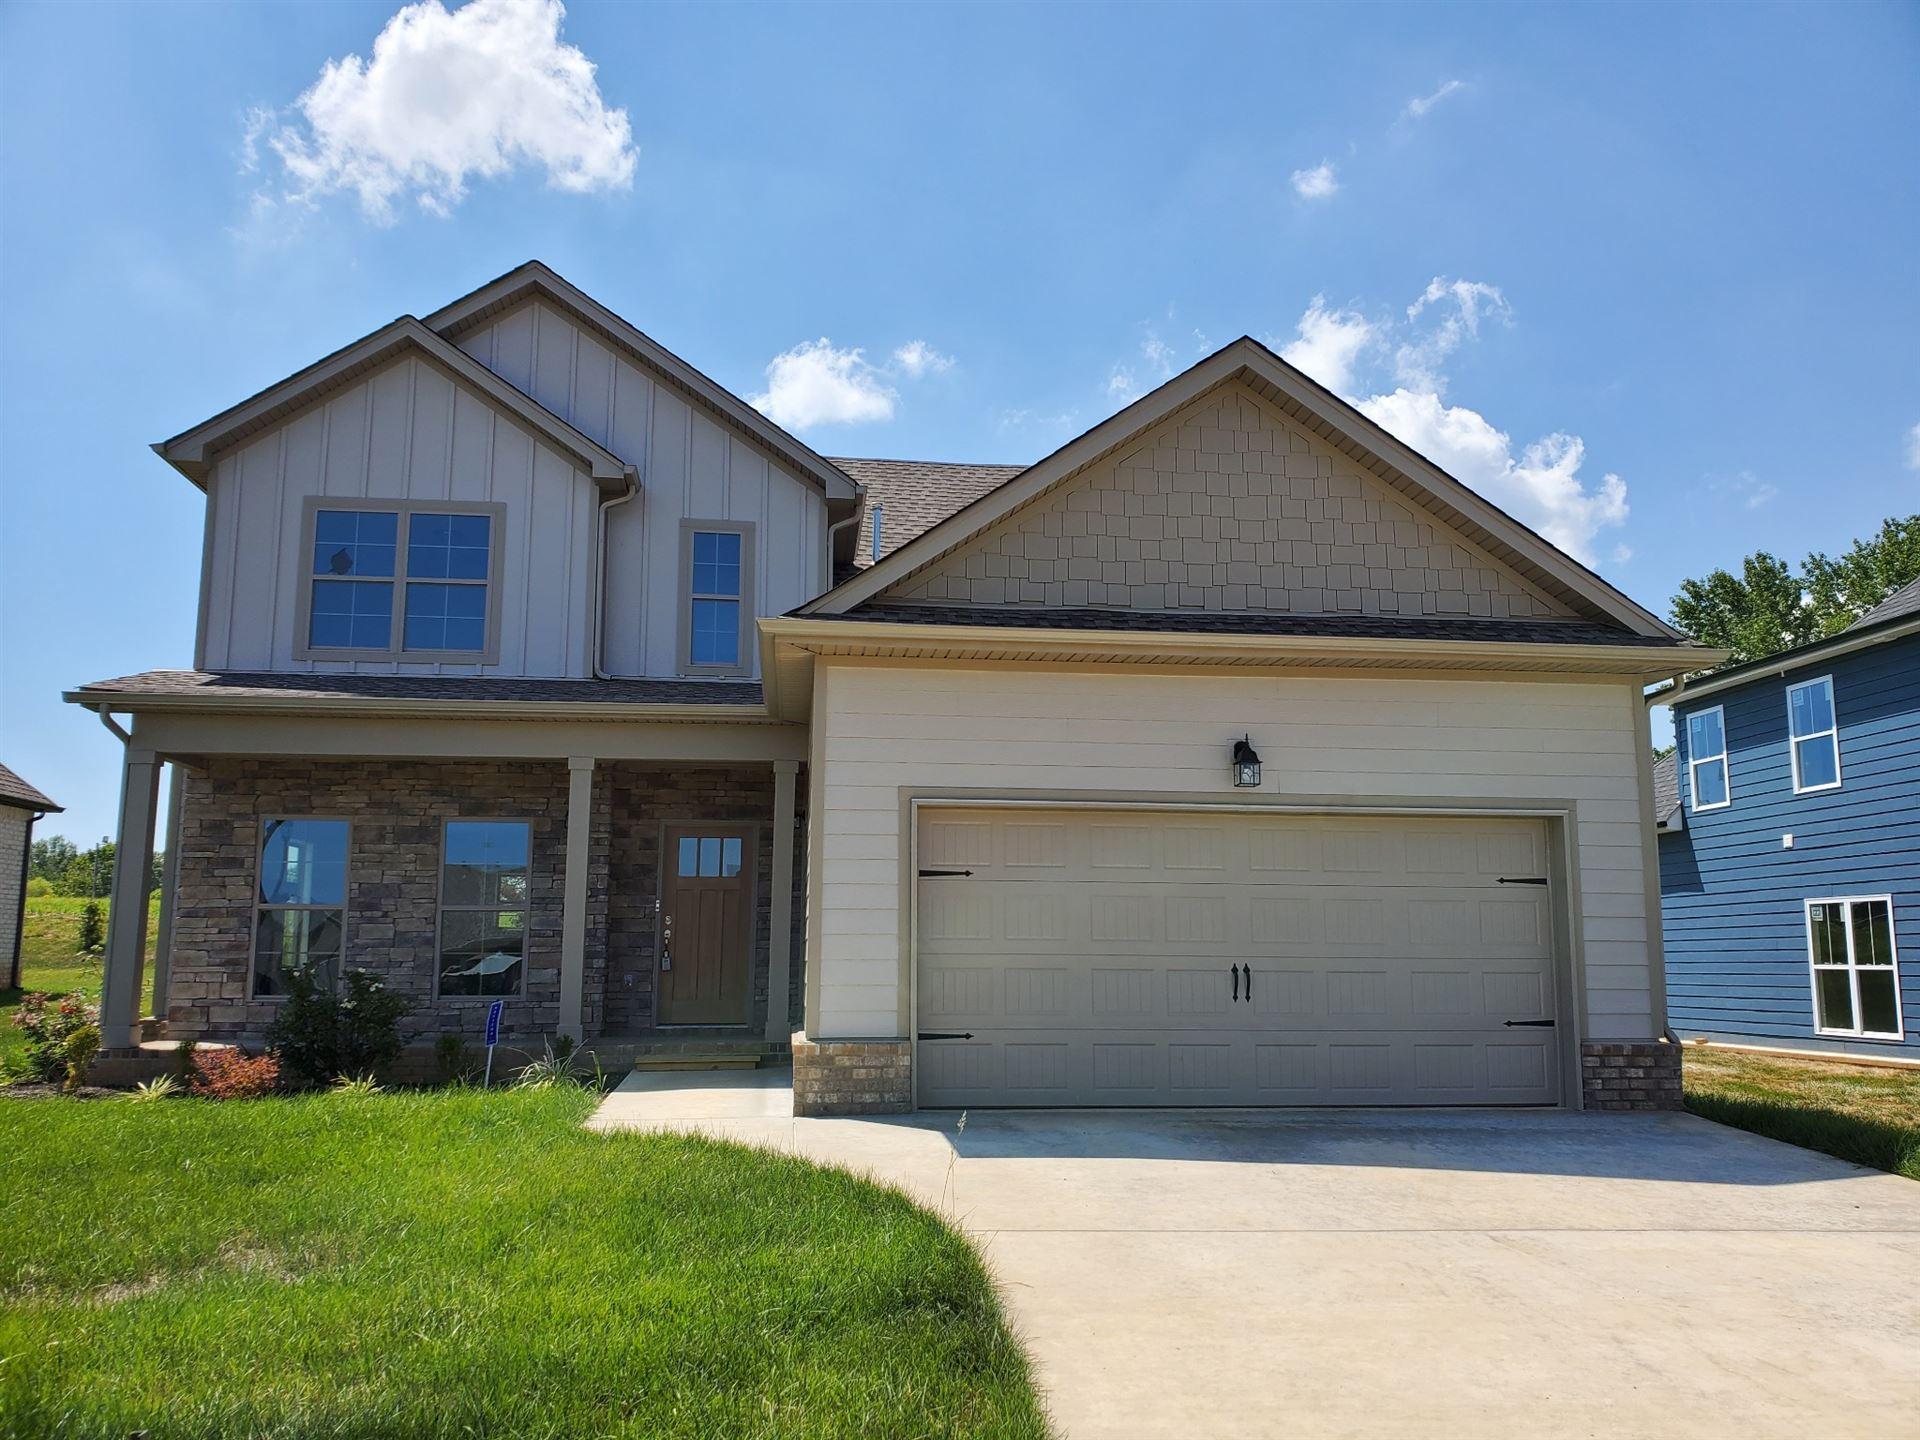 796 Jersey Dr Lot 27, Clarksville, TN 37043 - MLS#: 2169391